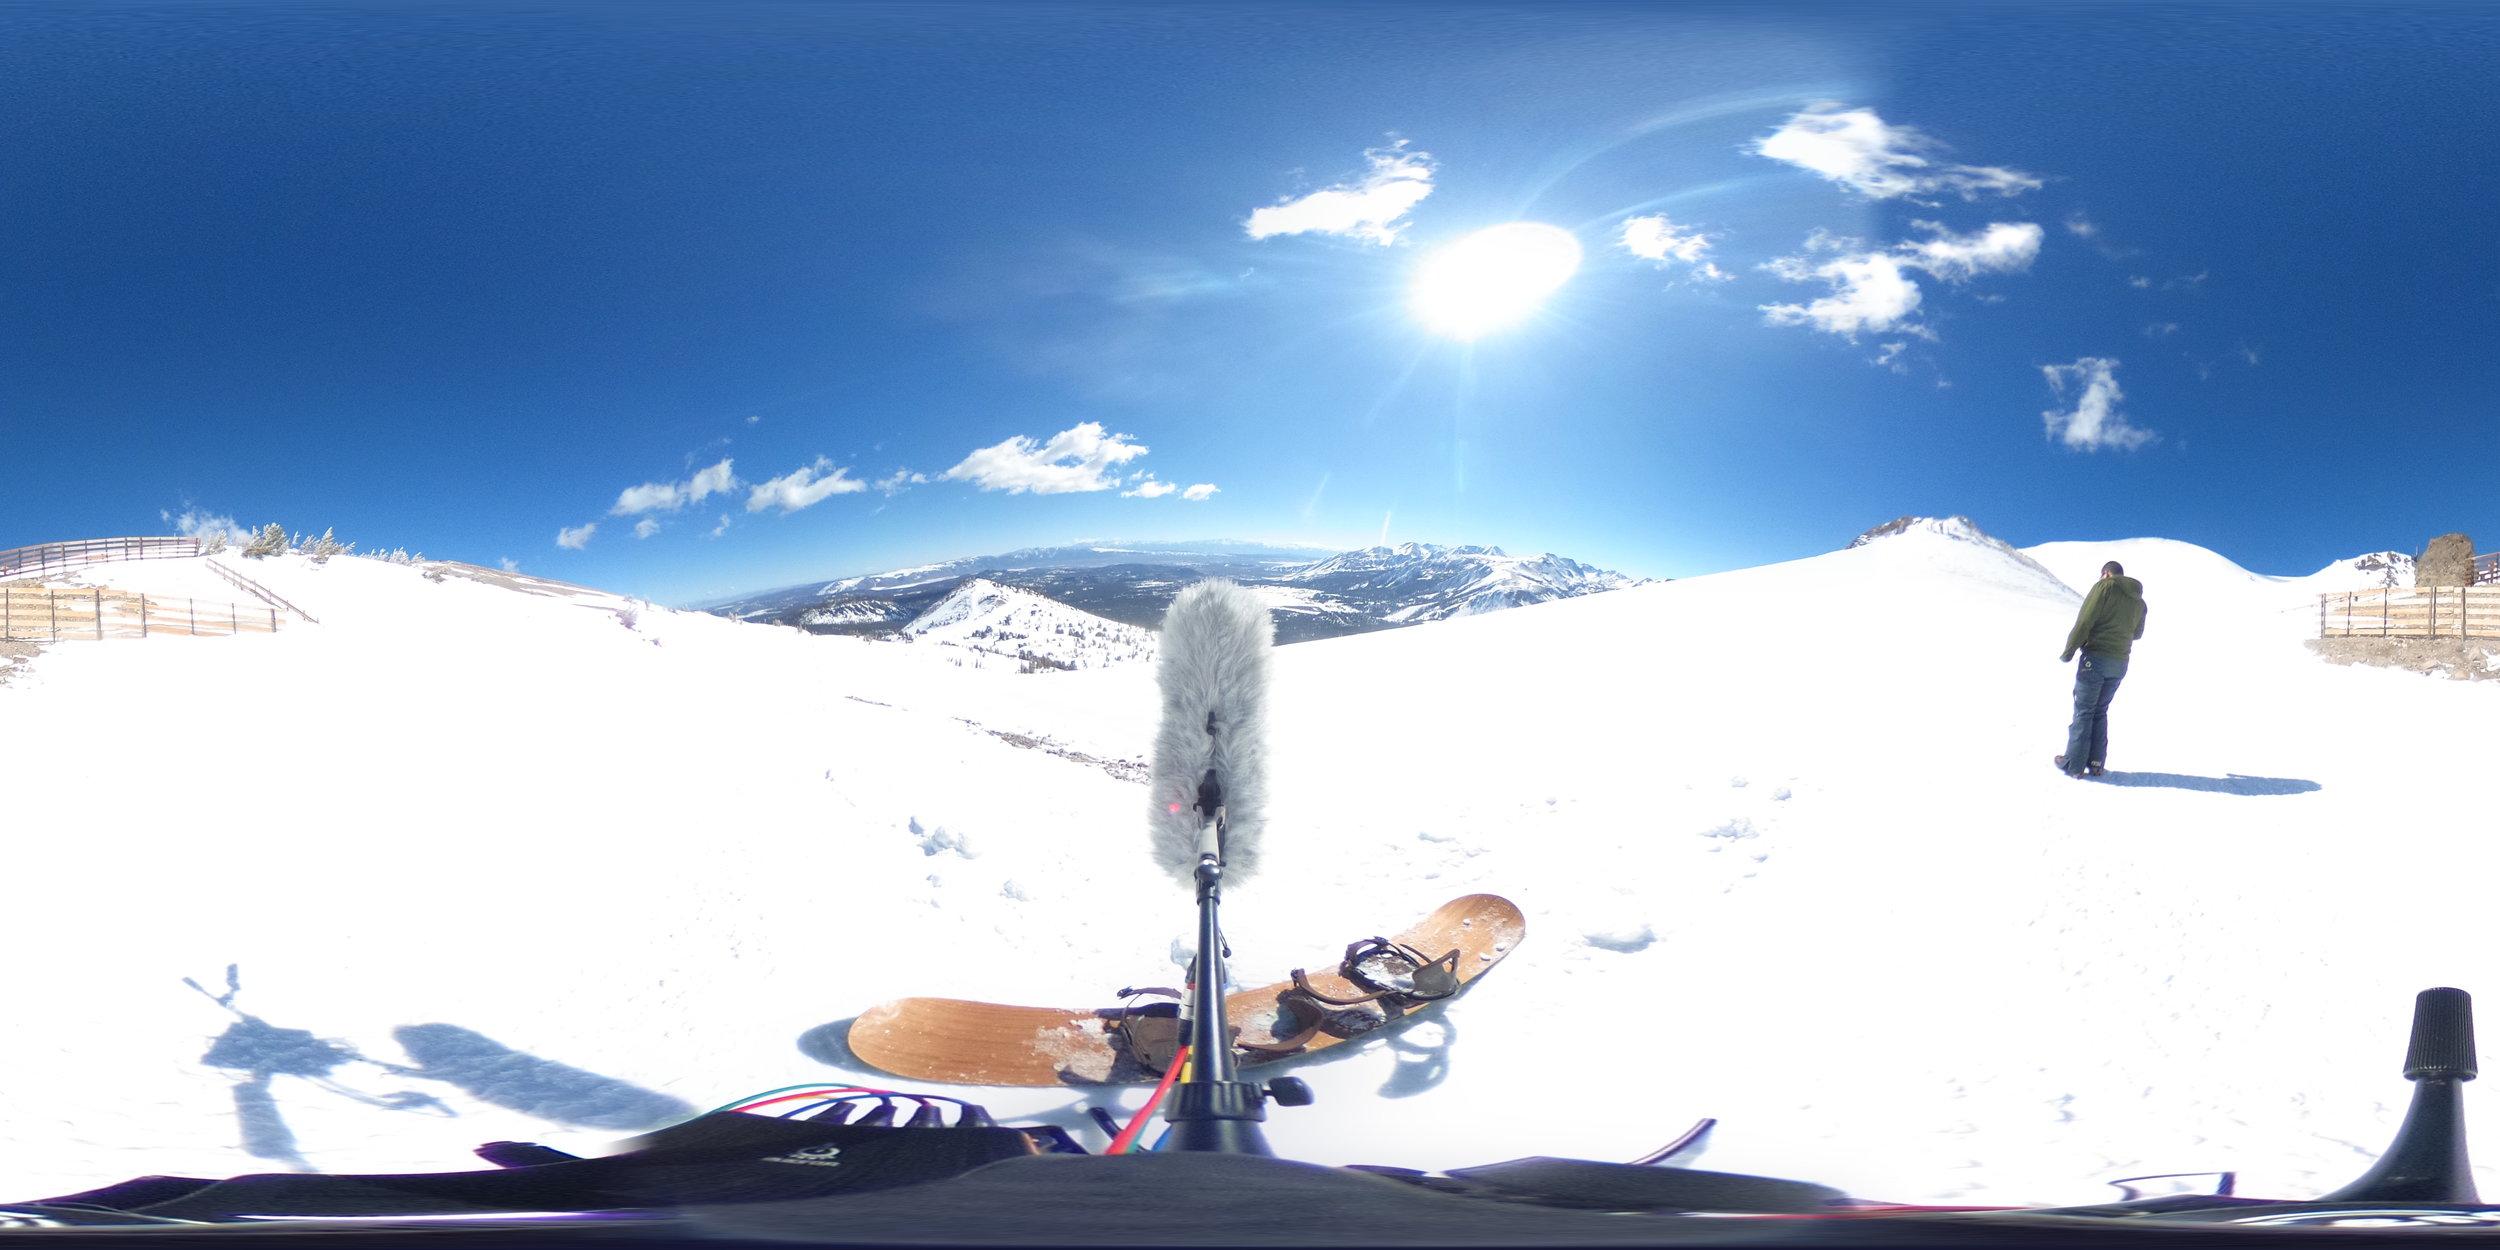 EXT_Day_Snow_SkiSlope_MidSlope_MediumToCloseSkiAndSnowboardBysMediumToFastSpeed_LightSporadicWalla_JPEG.JPG